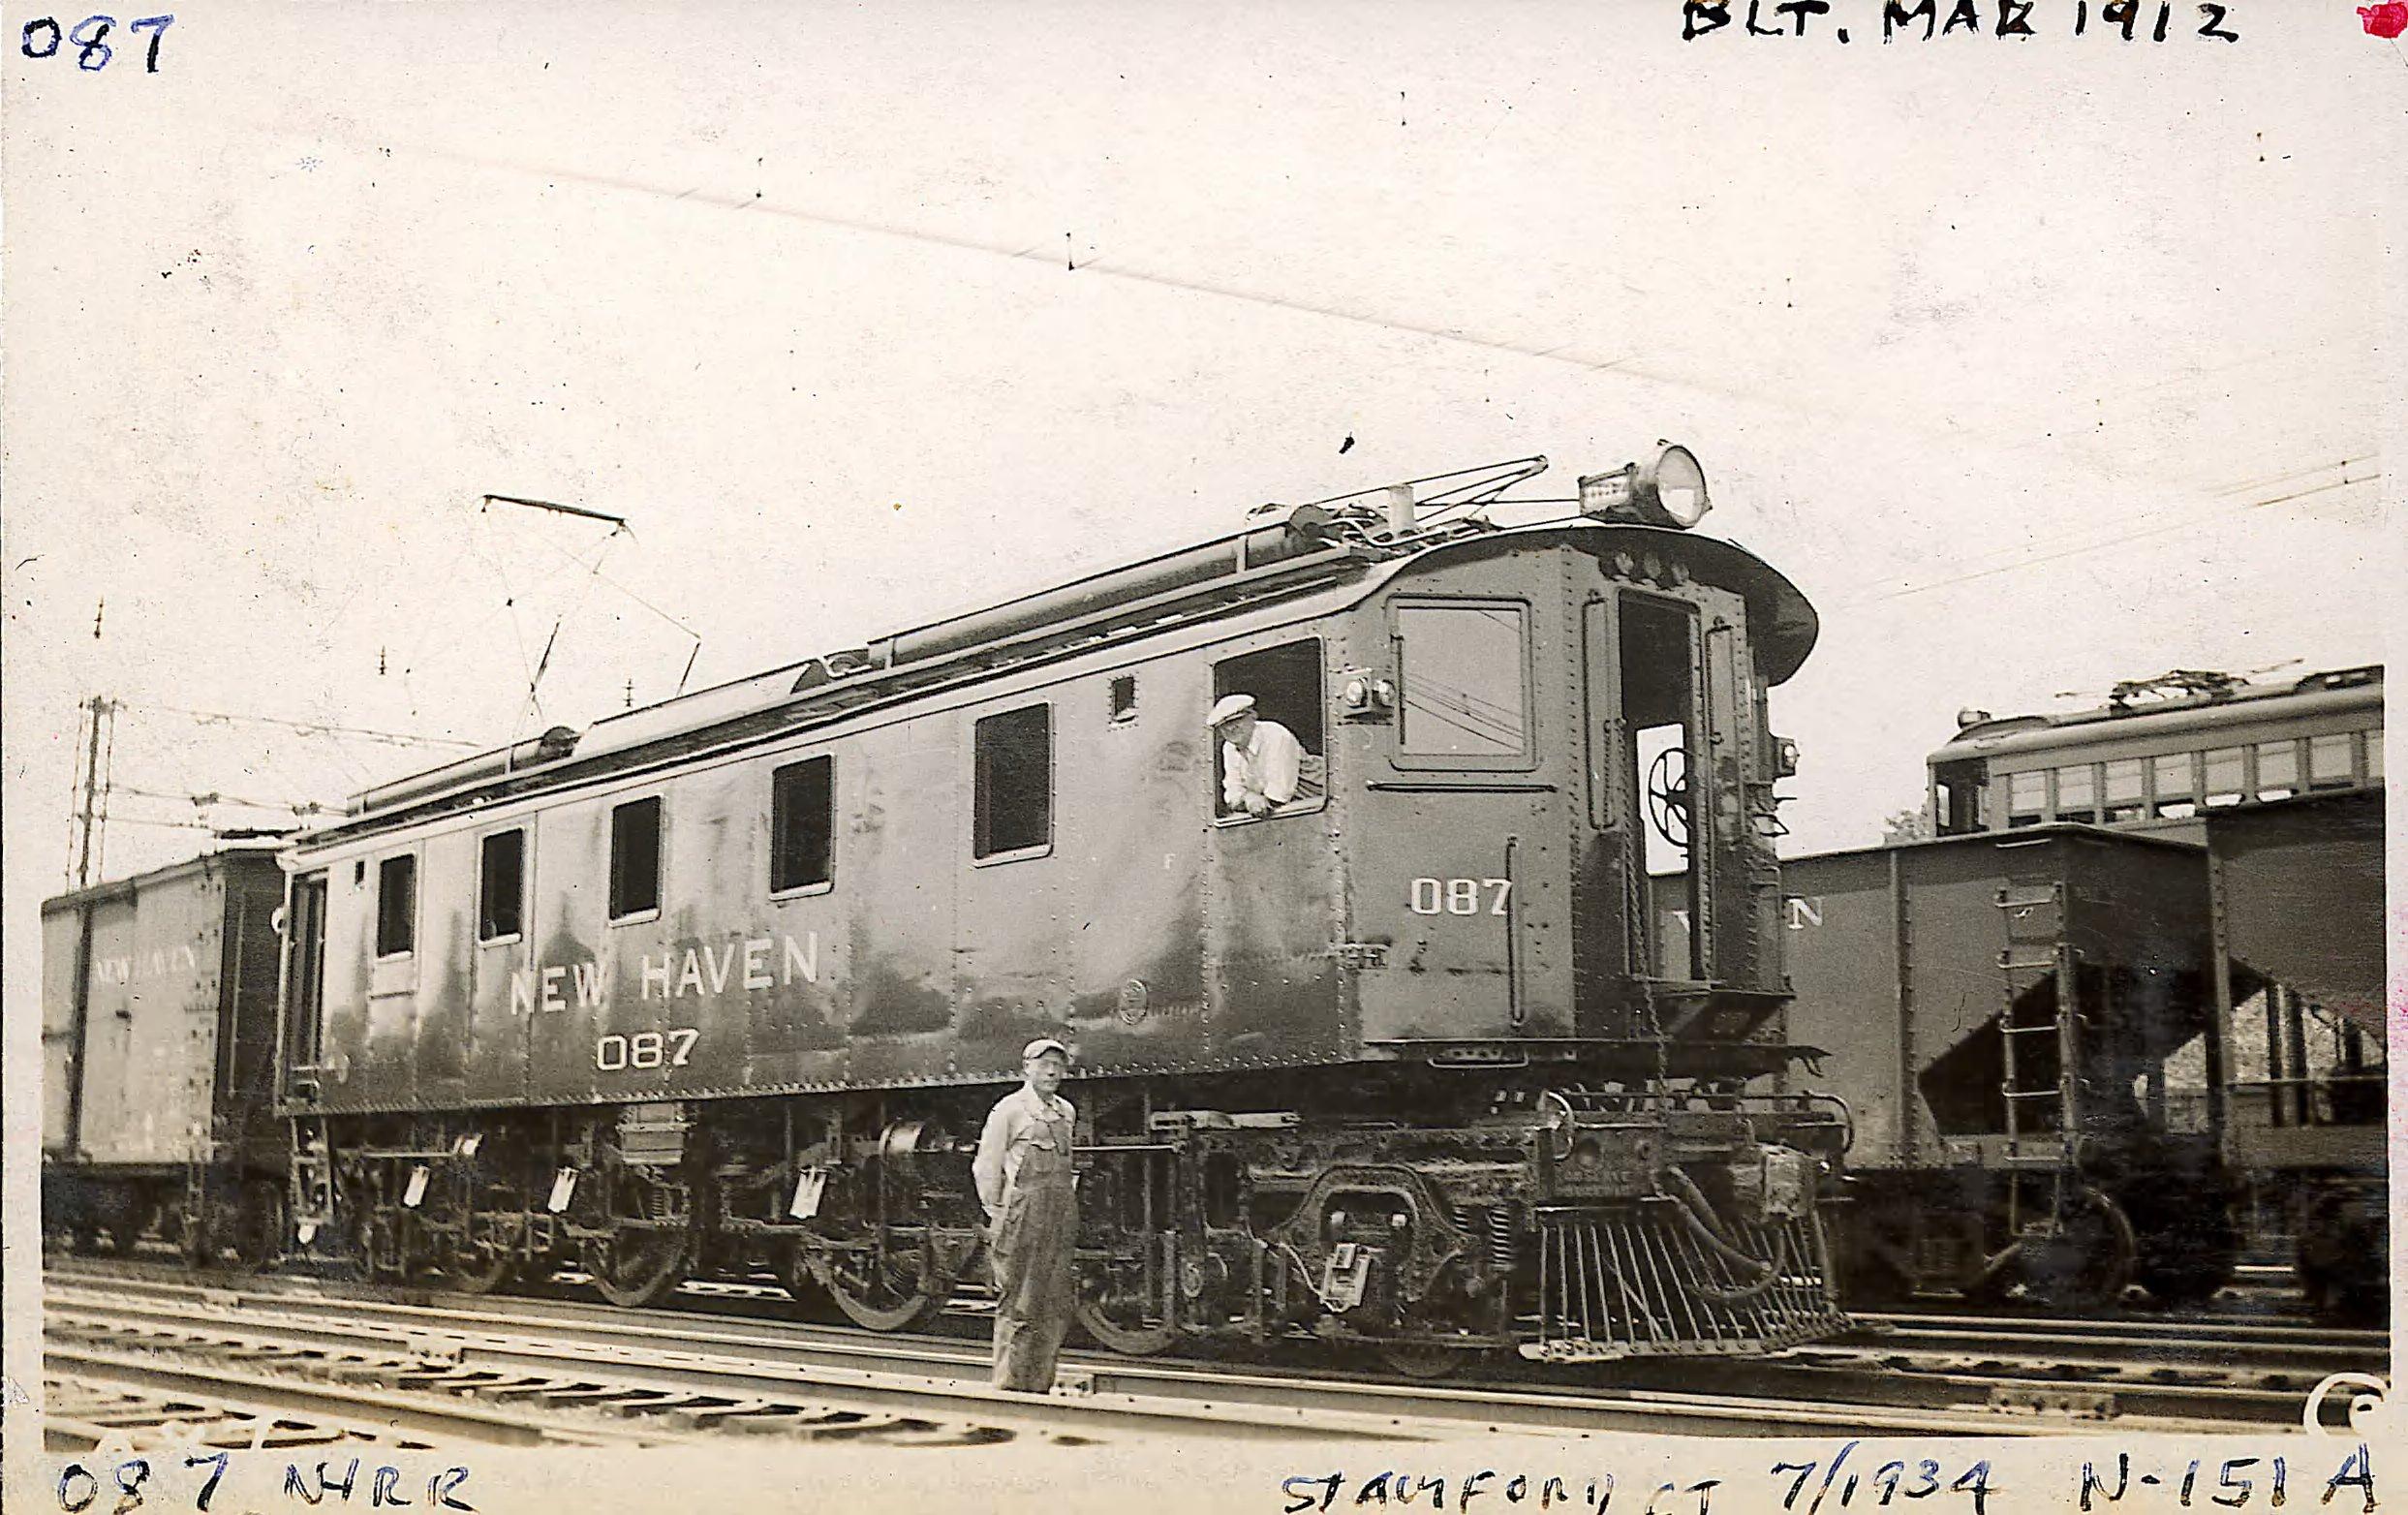 Locomotive 087, built March 1912